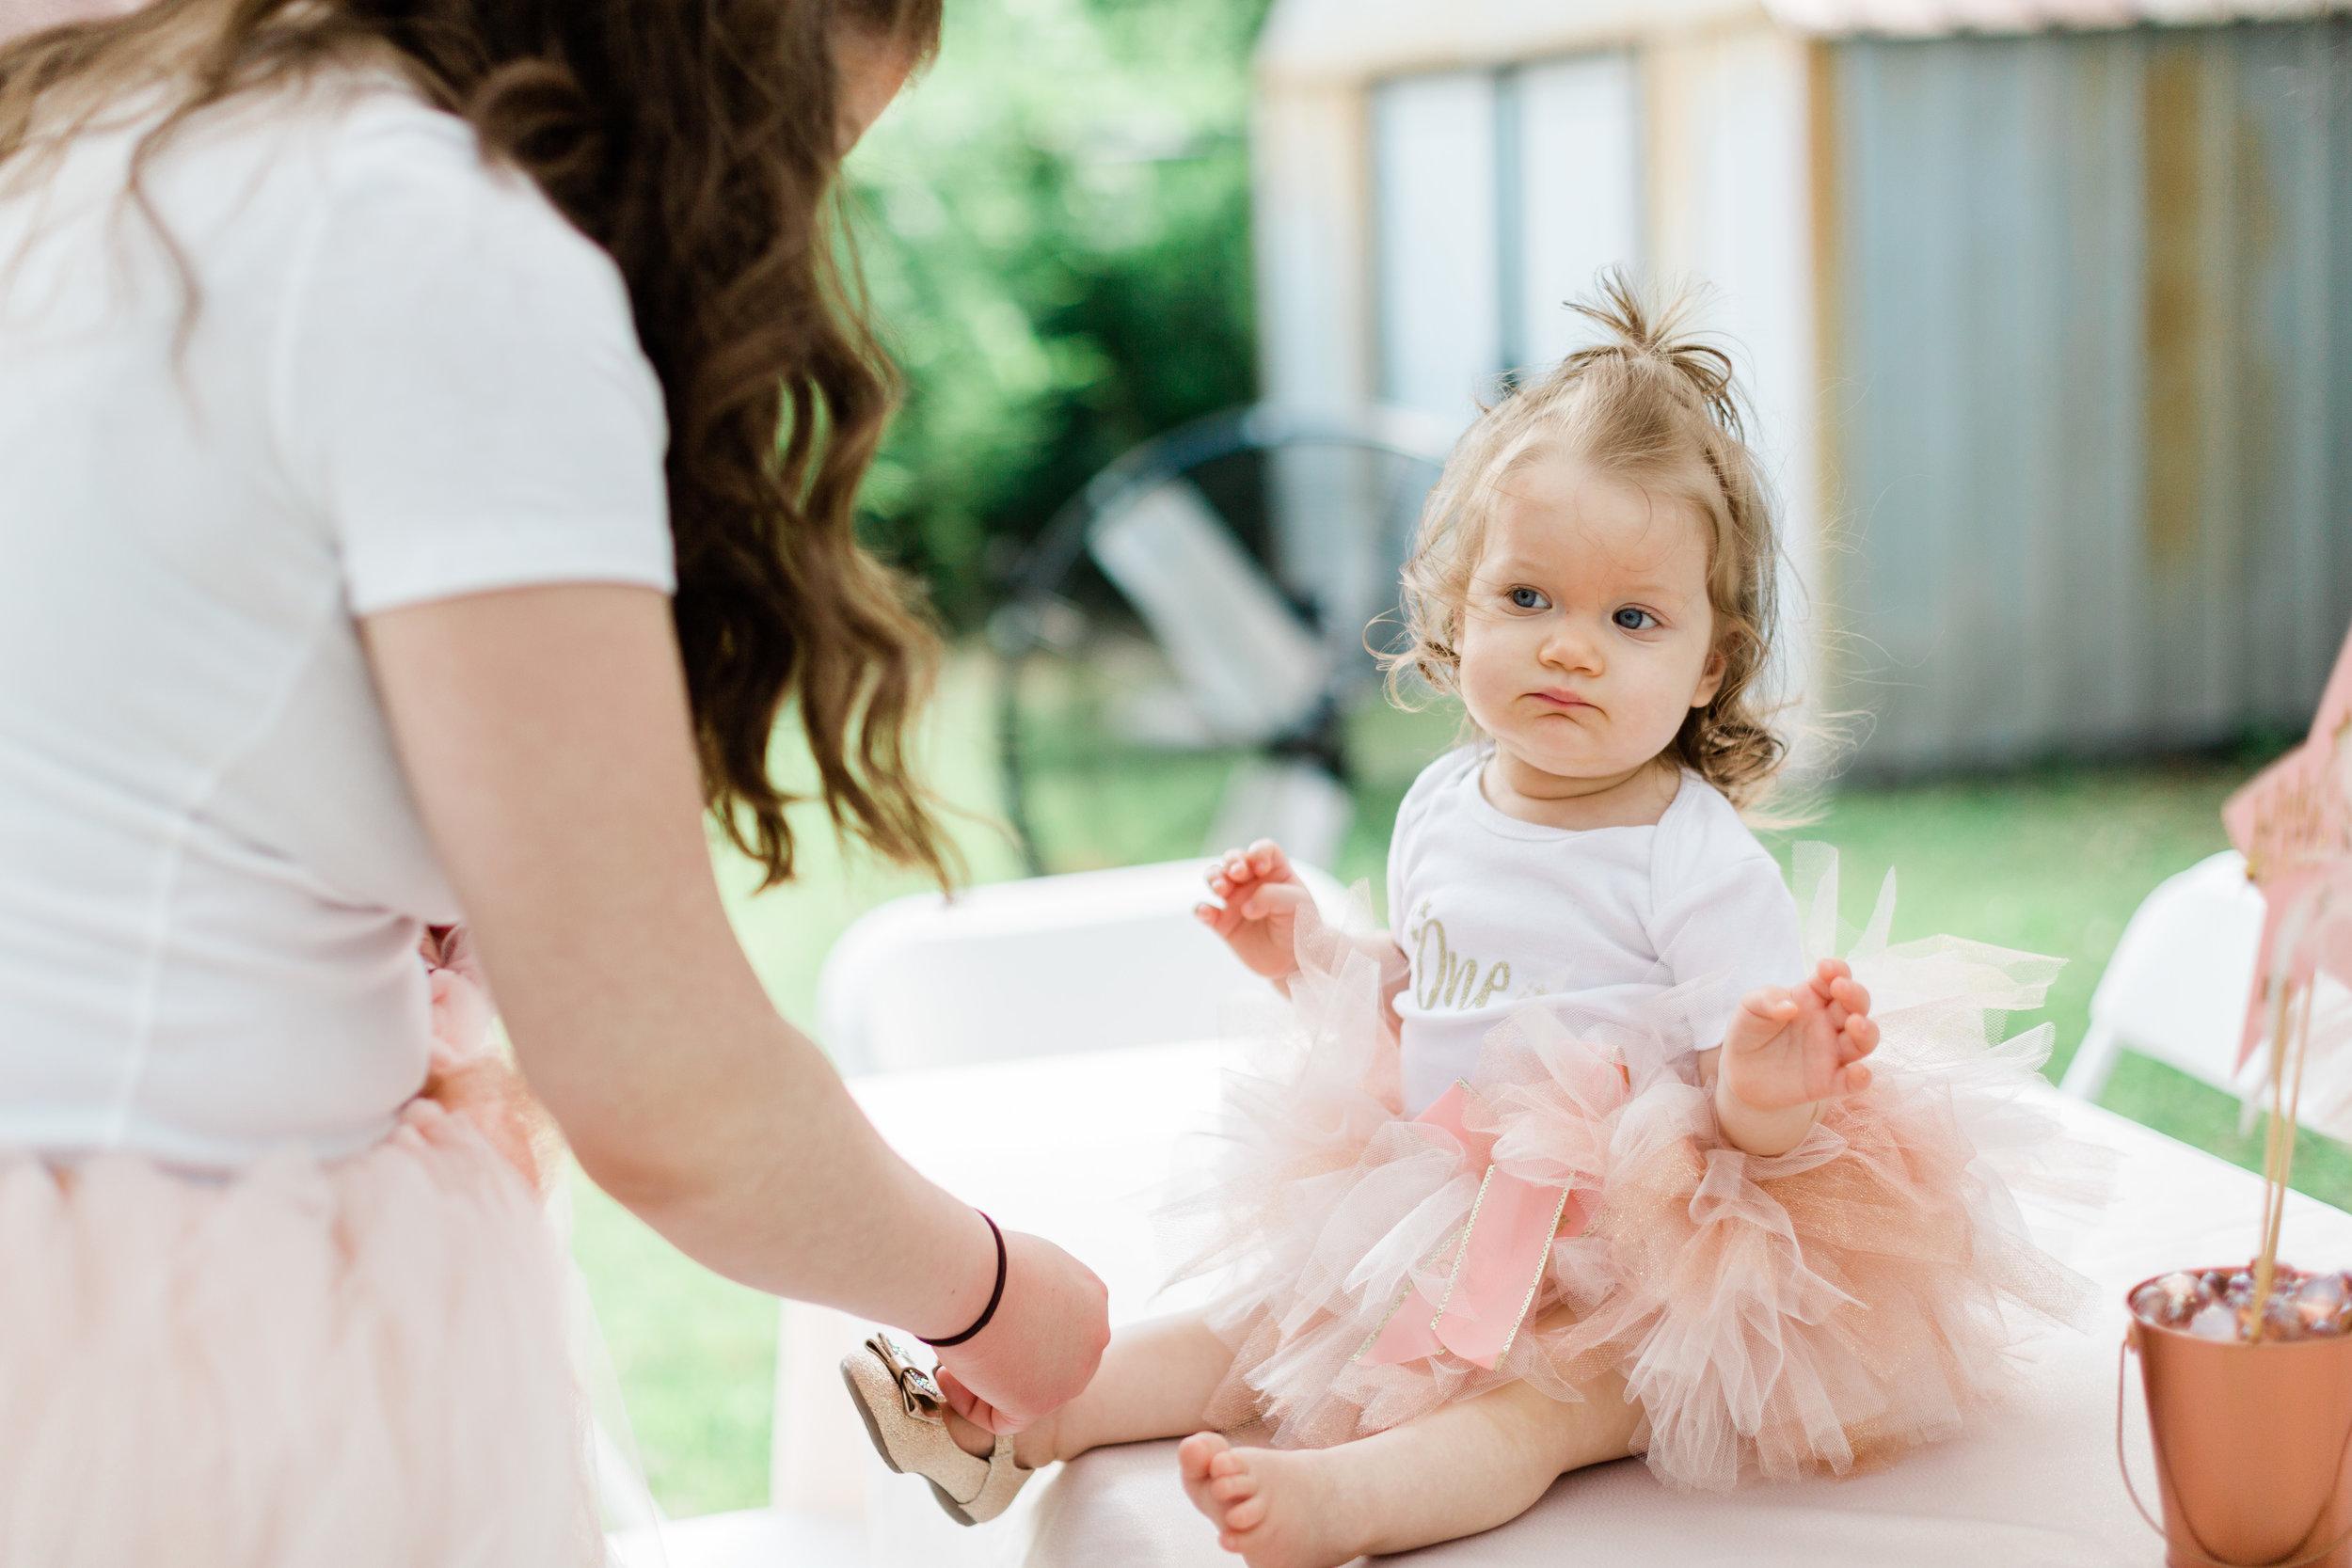 nashville-franklin-lifestyle-photographer-kids-birthday-1.jpg